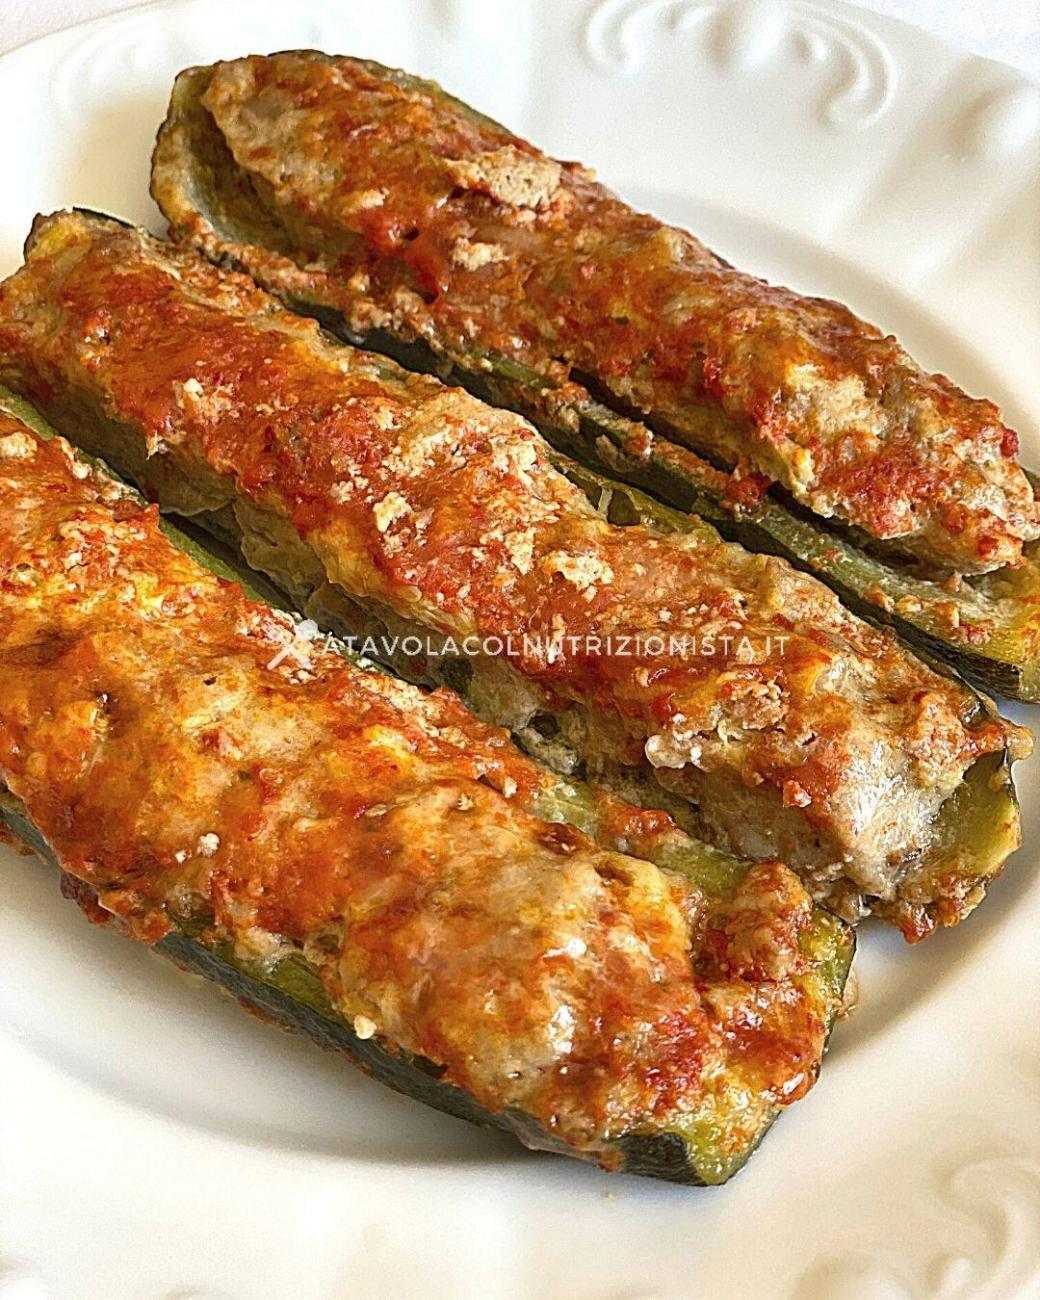 Ricetta Zucchine Ripiene Di Carne Al Sugo.Ricetta Light Zucchine Ripiene Di Carne A Tavola Col Nutrizionista